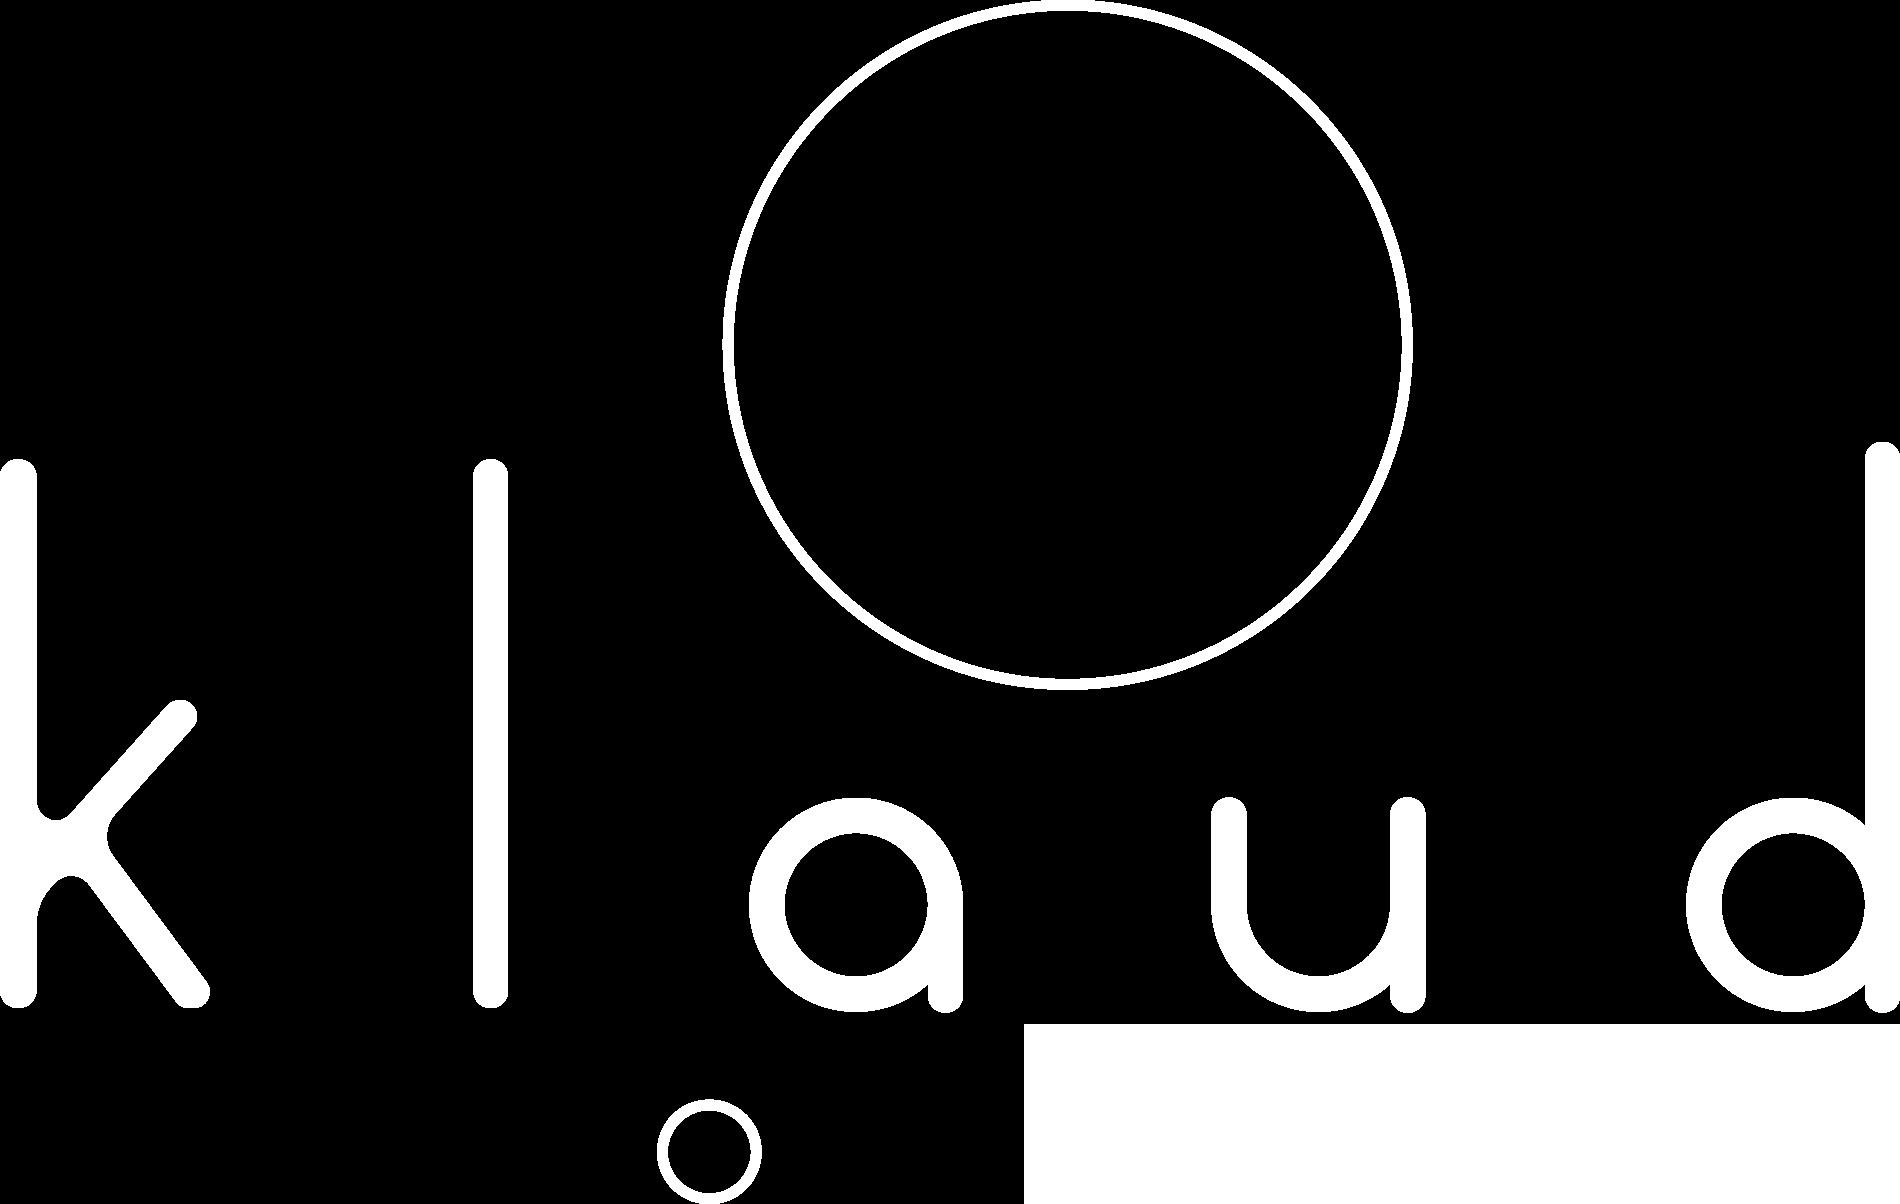 klaud_logo_transparent_bg